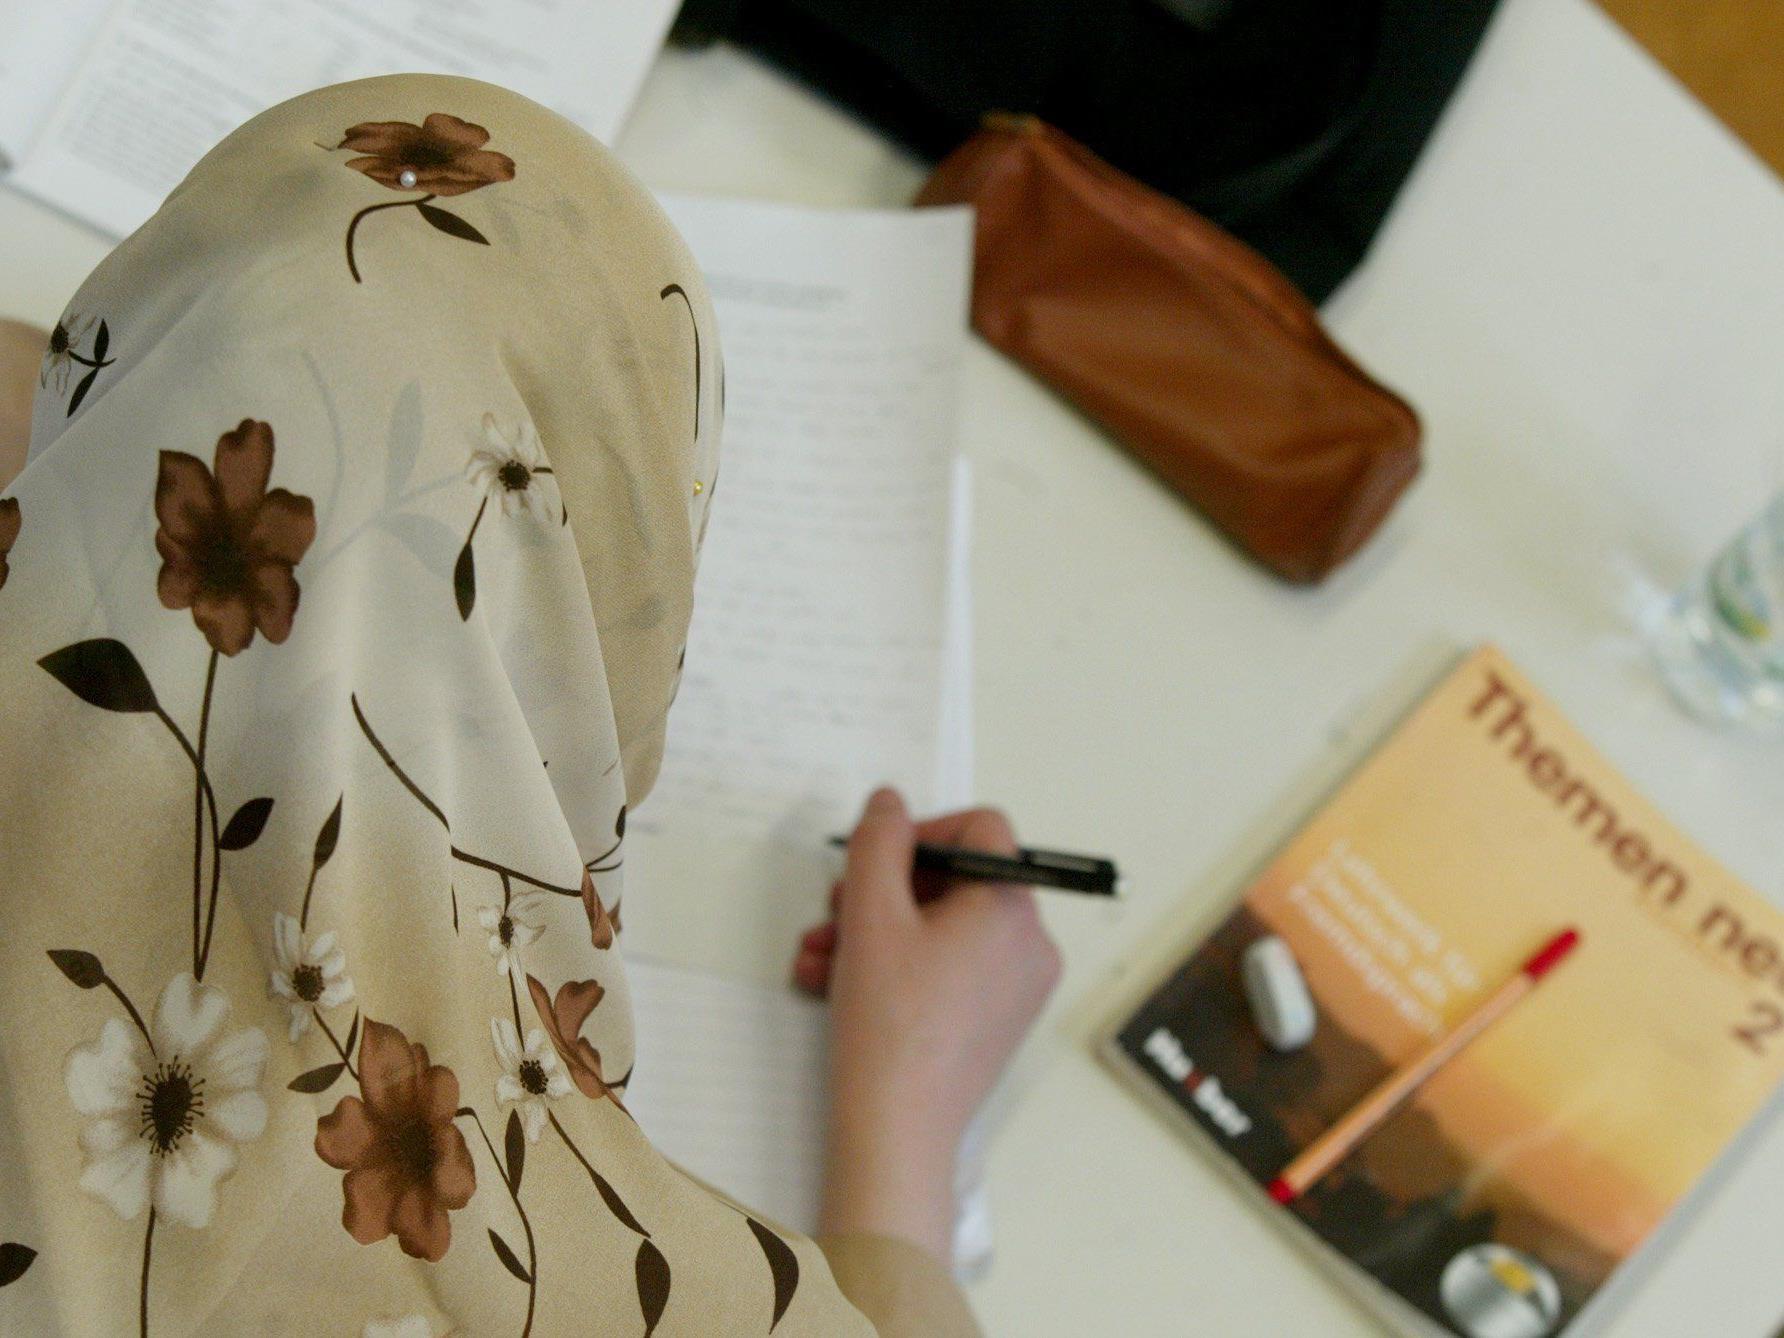 Islam-Schule: Islamische Föderation verteidigt Projekt